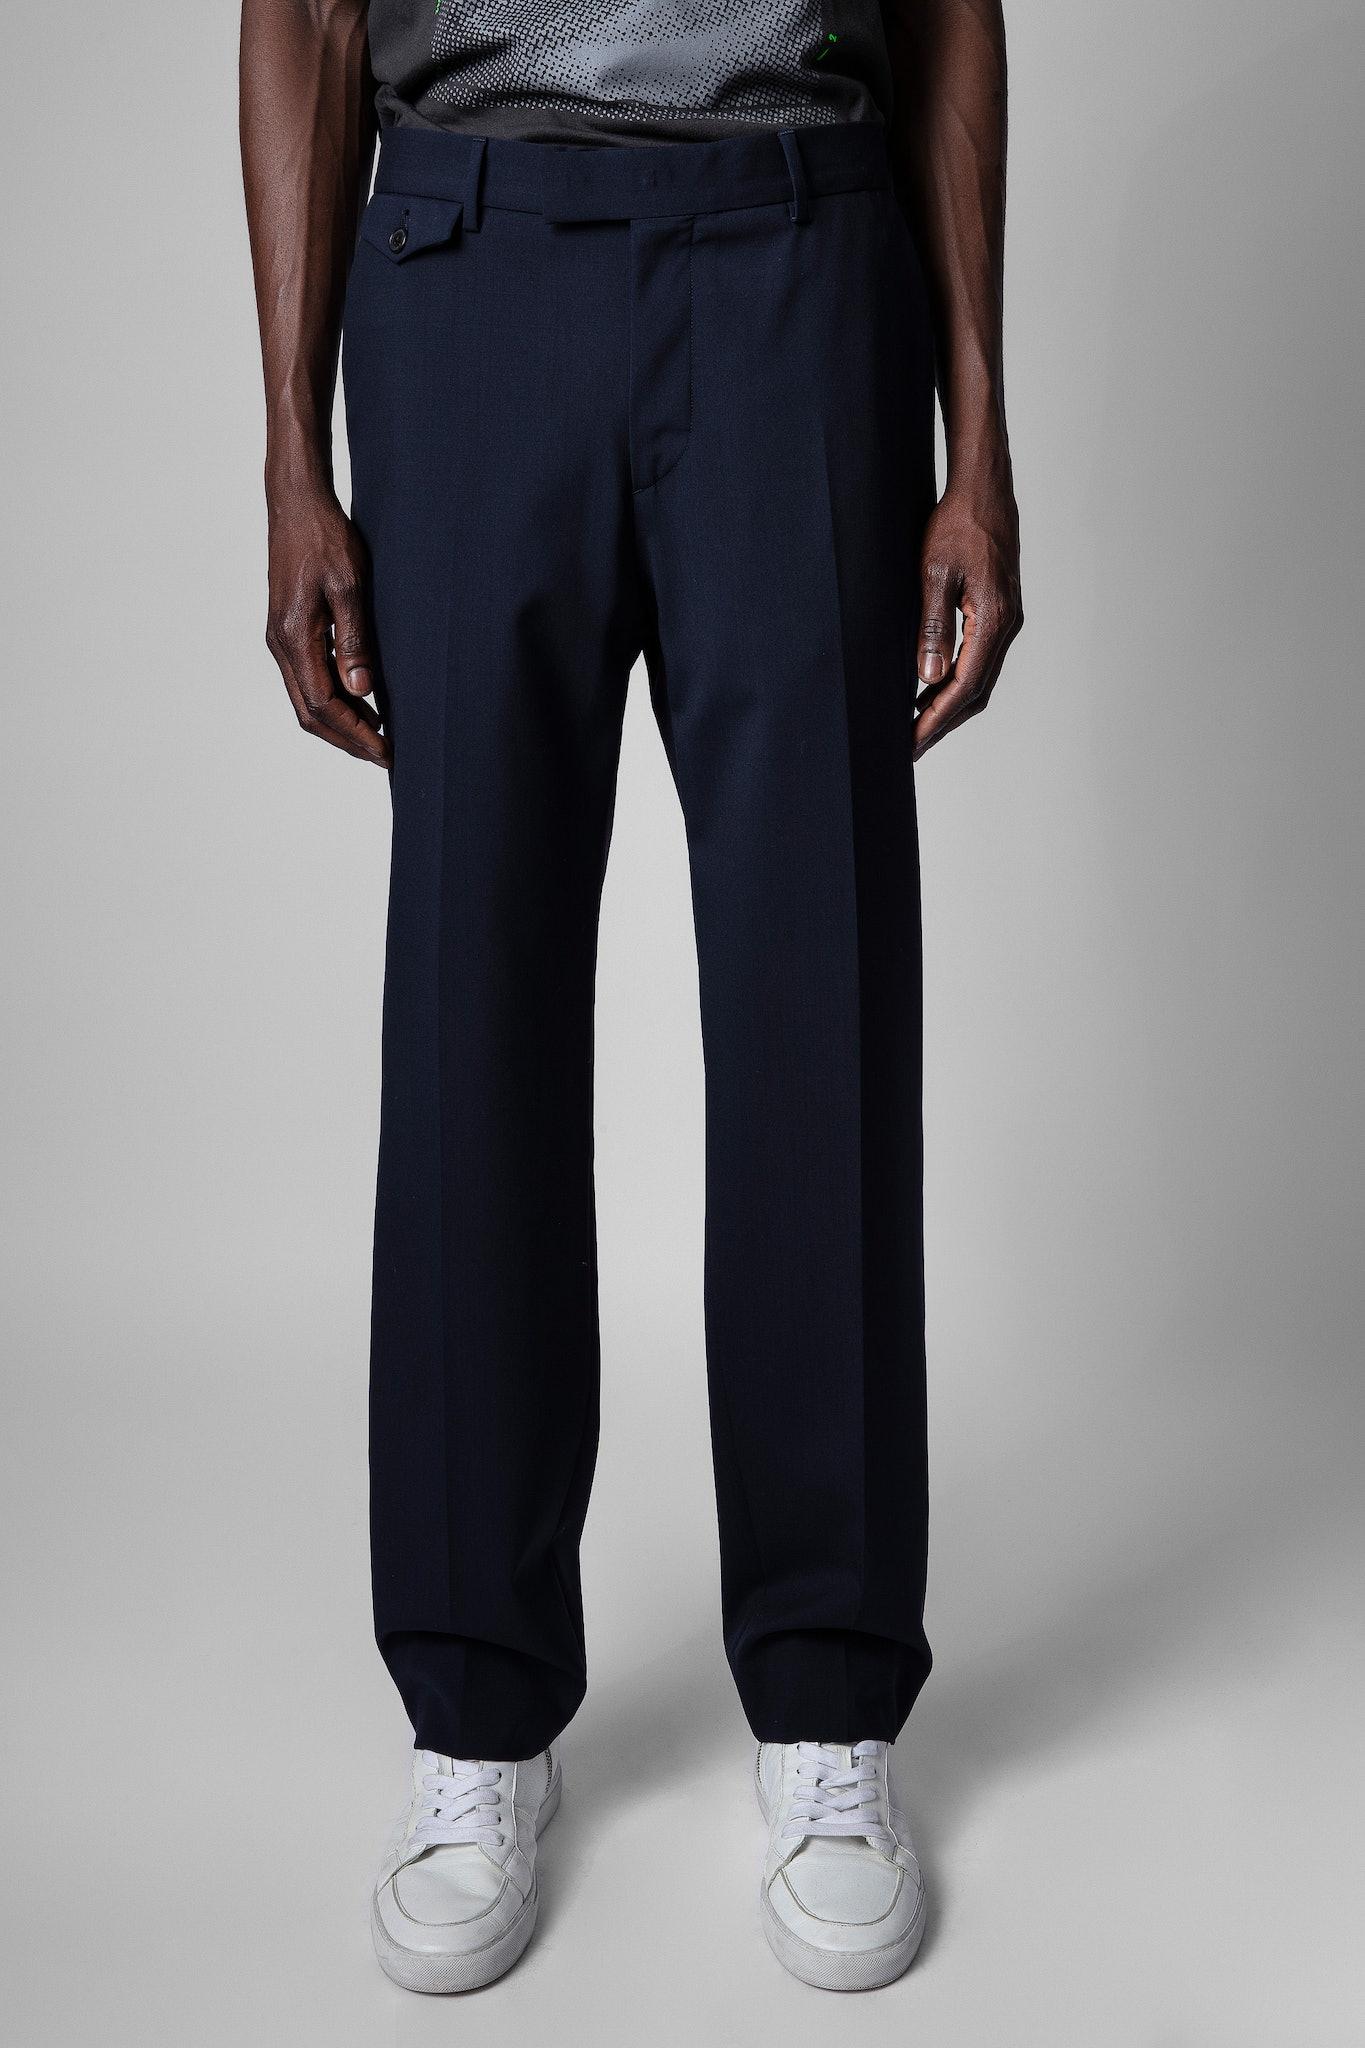 Phelis Trousers